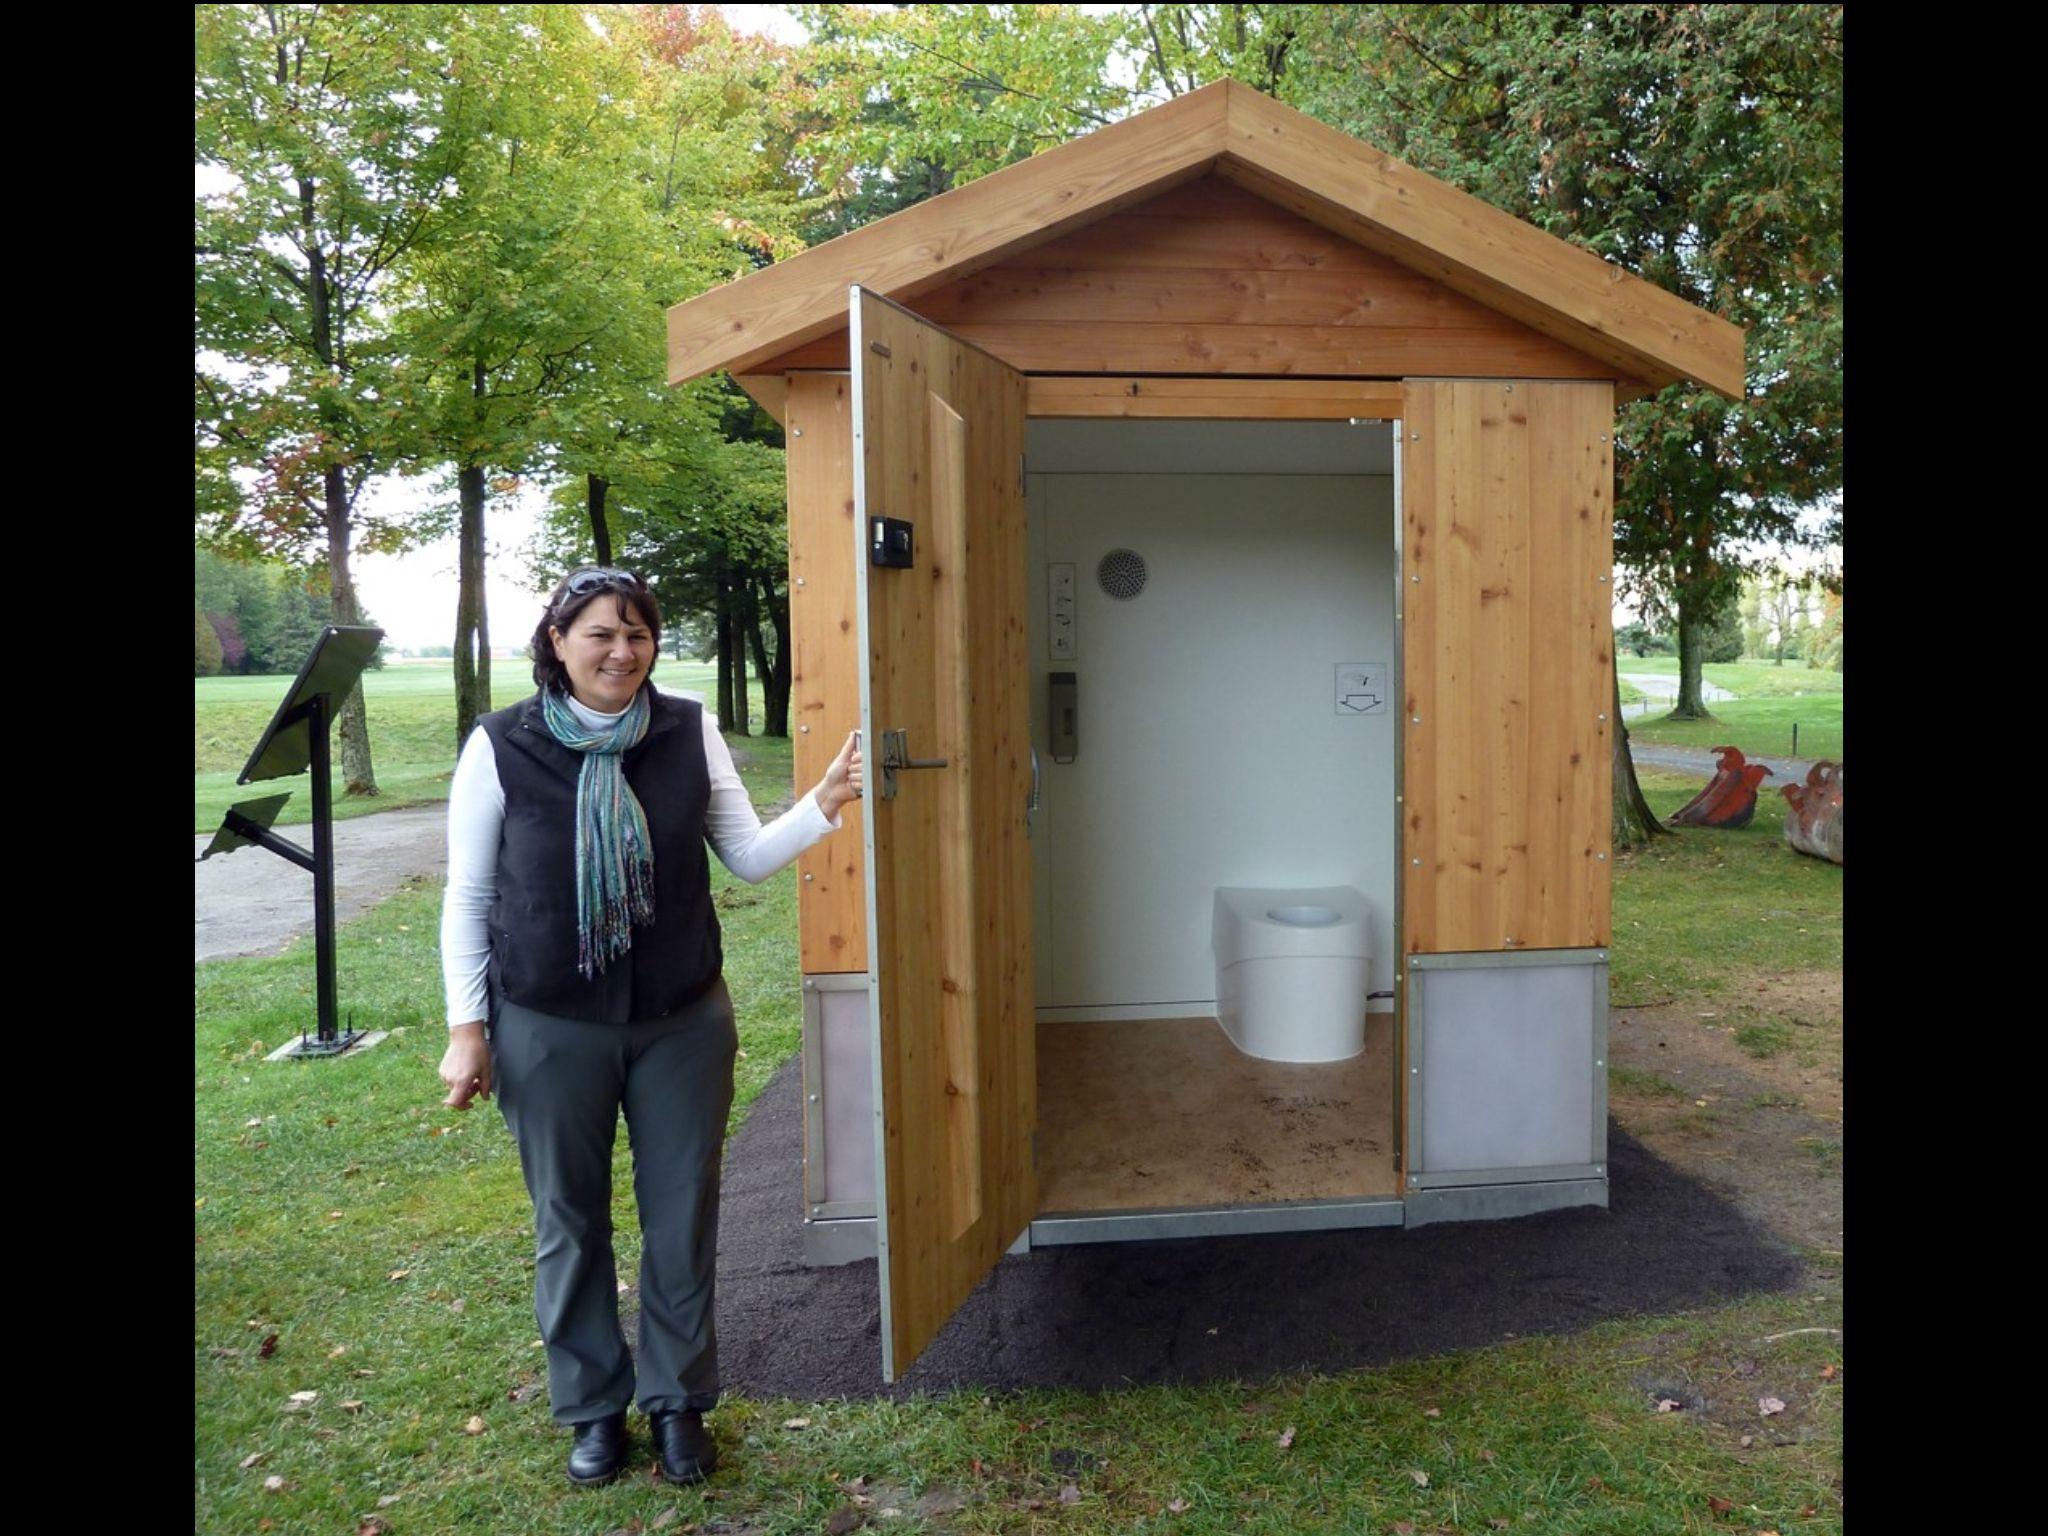 Outdoor toilet | Off the Wall | Pinterest | Outdoor toilet ...